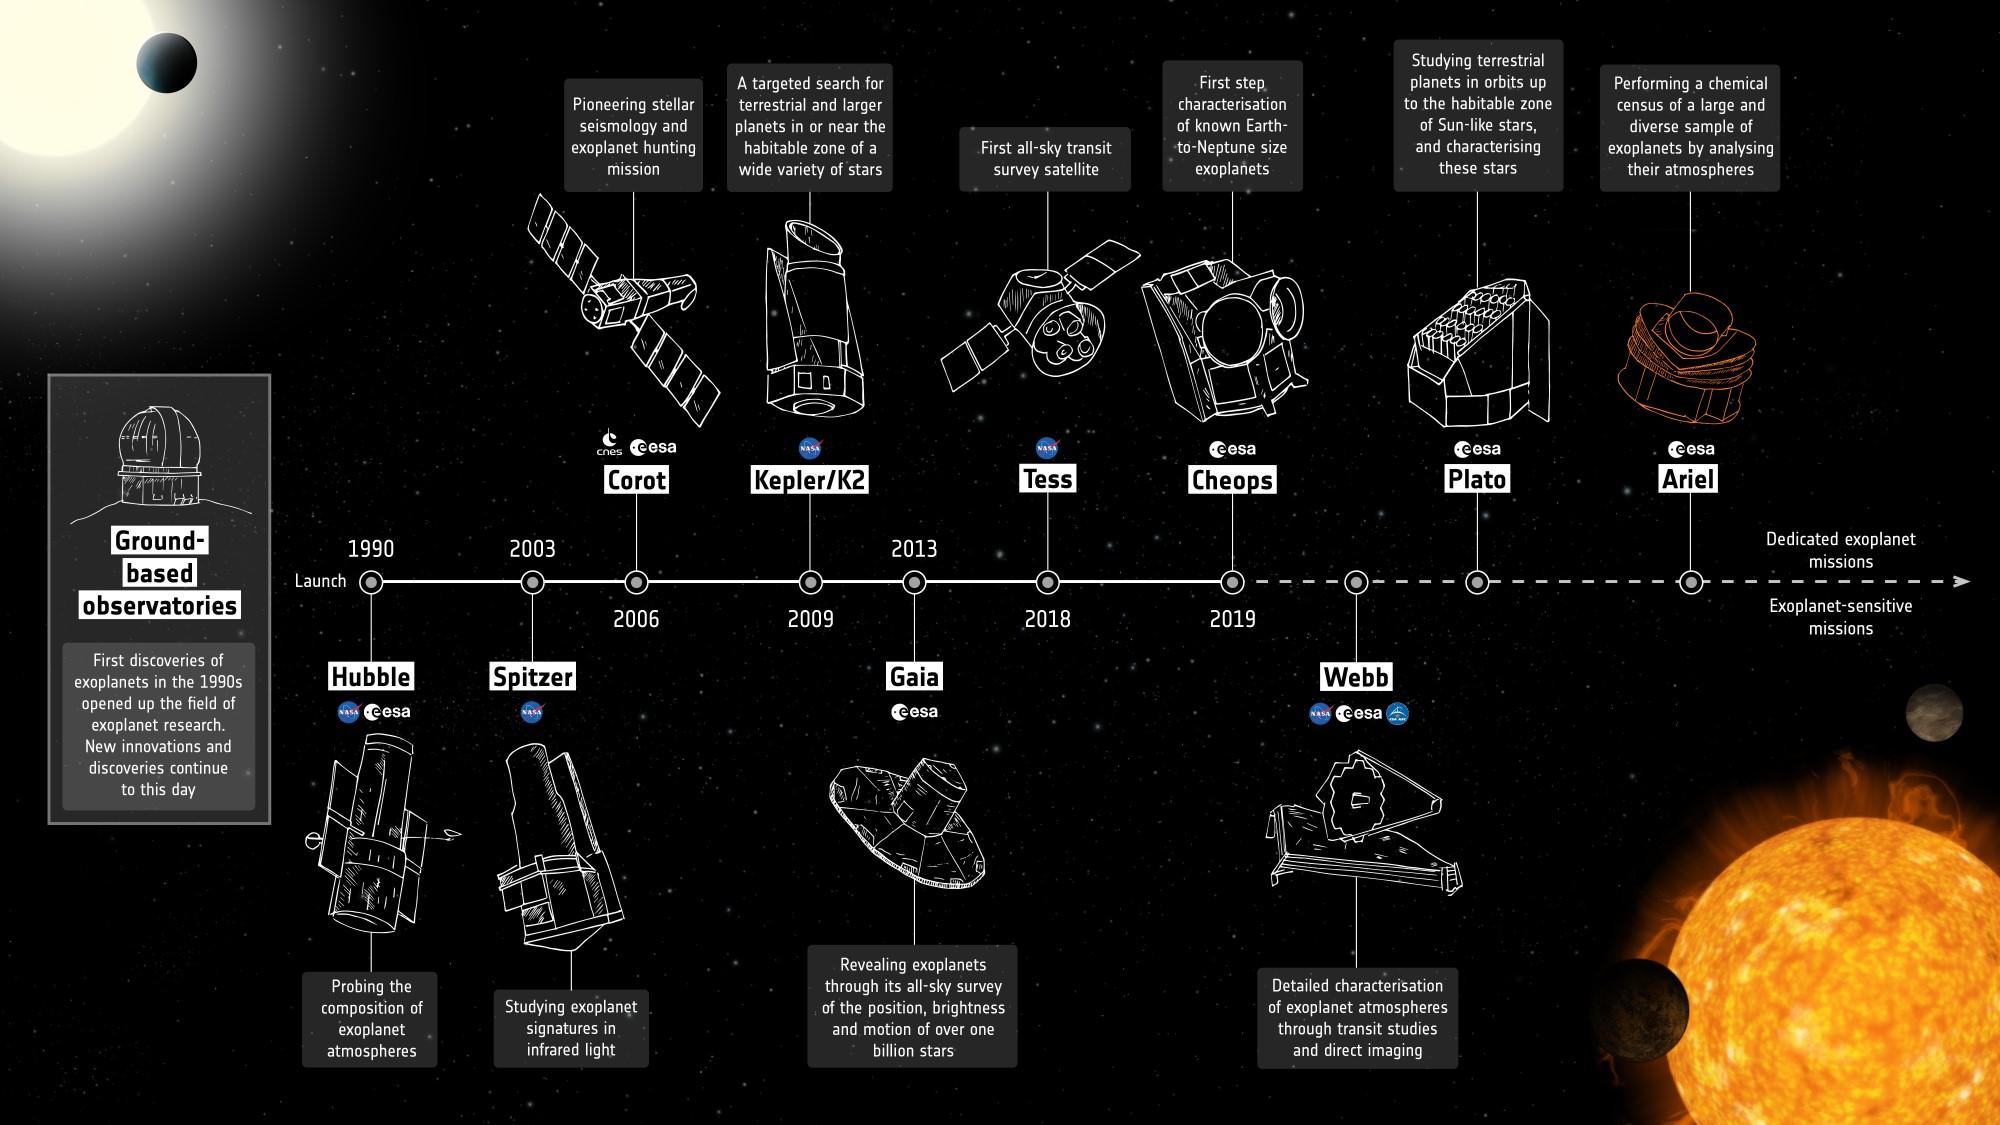 Exoplanets_missions_20201127_ariel_2k.jpg